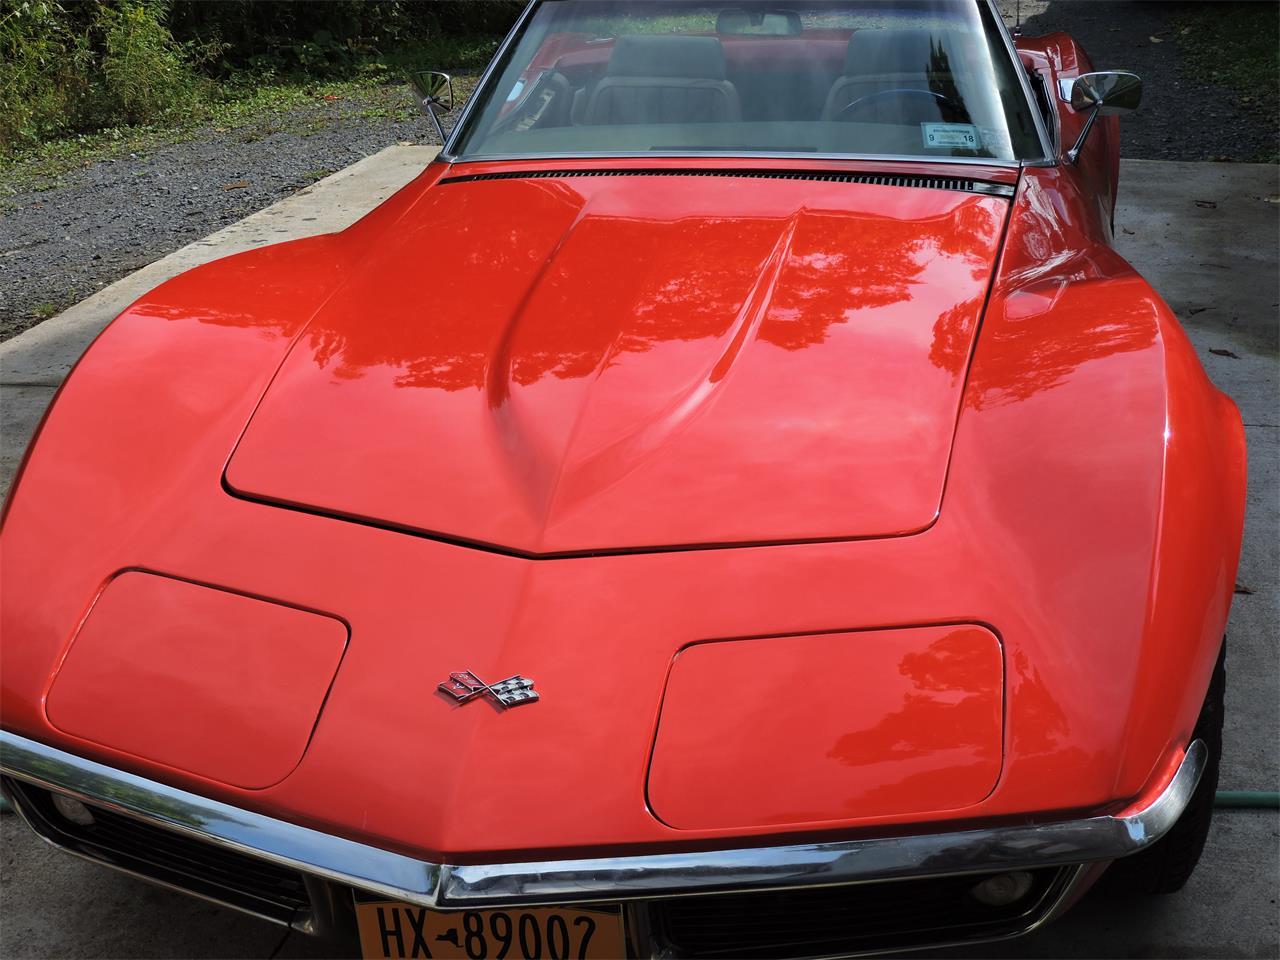 1969 Chevrolet Corvette (CC-1026916) for sale in Alplaus, New York